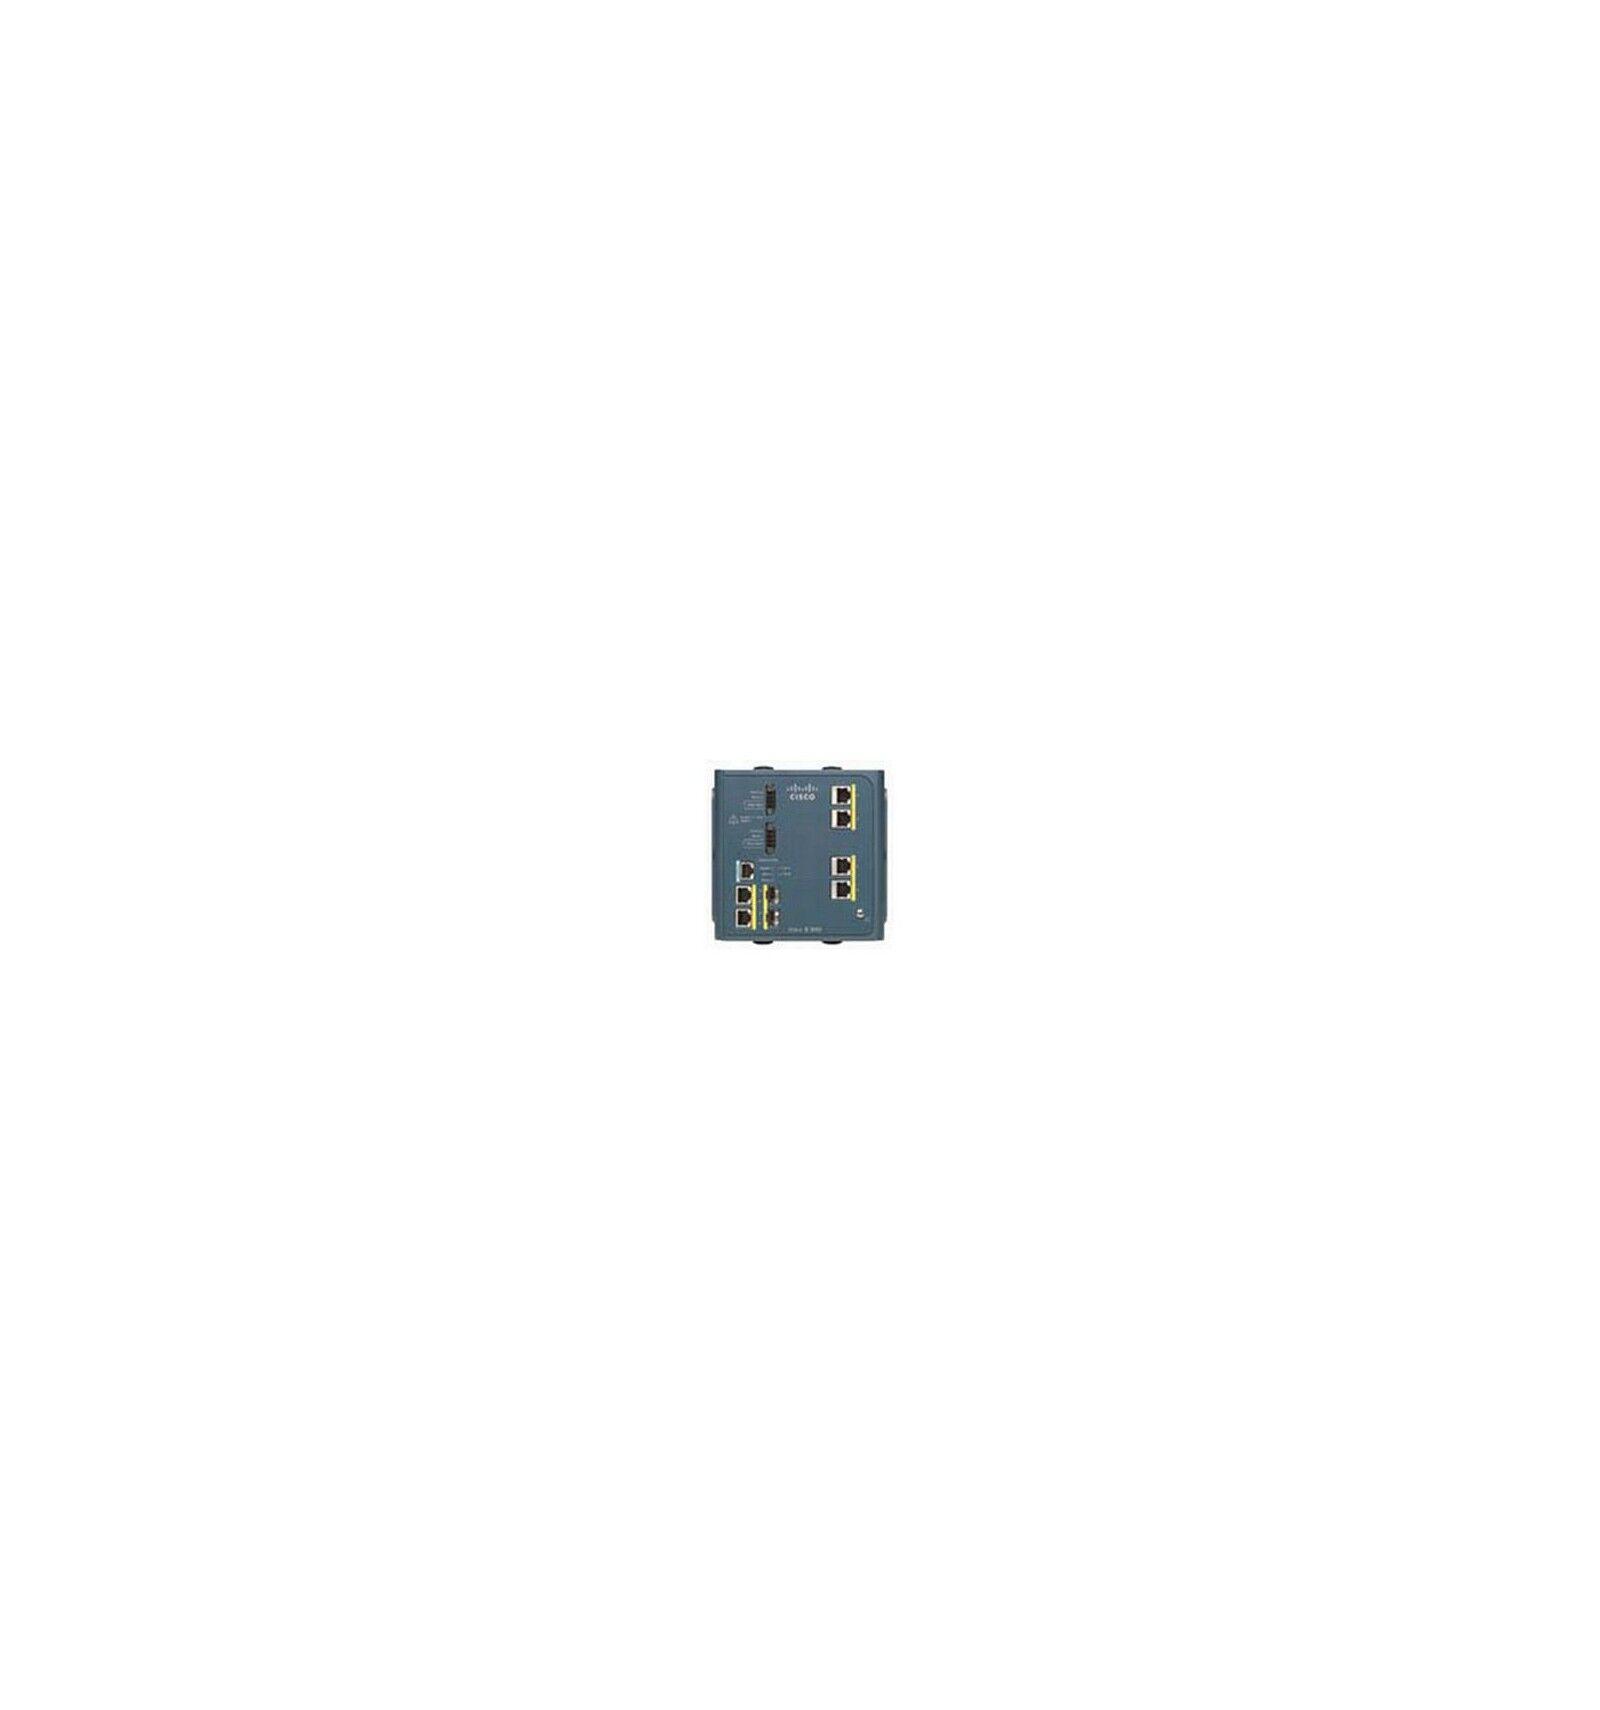 Cisco Systems IE-3000-4TC Managed network switch L2 Fast Ethernet (10/100) Sininen verkkokytkin